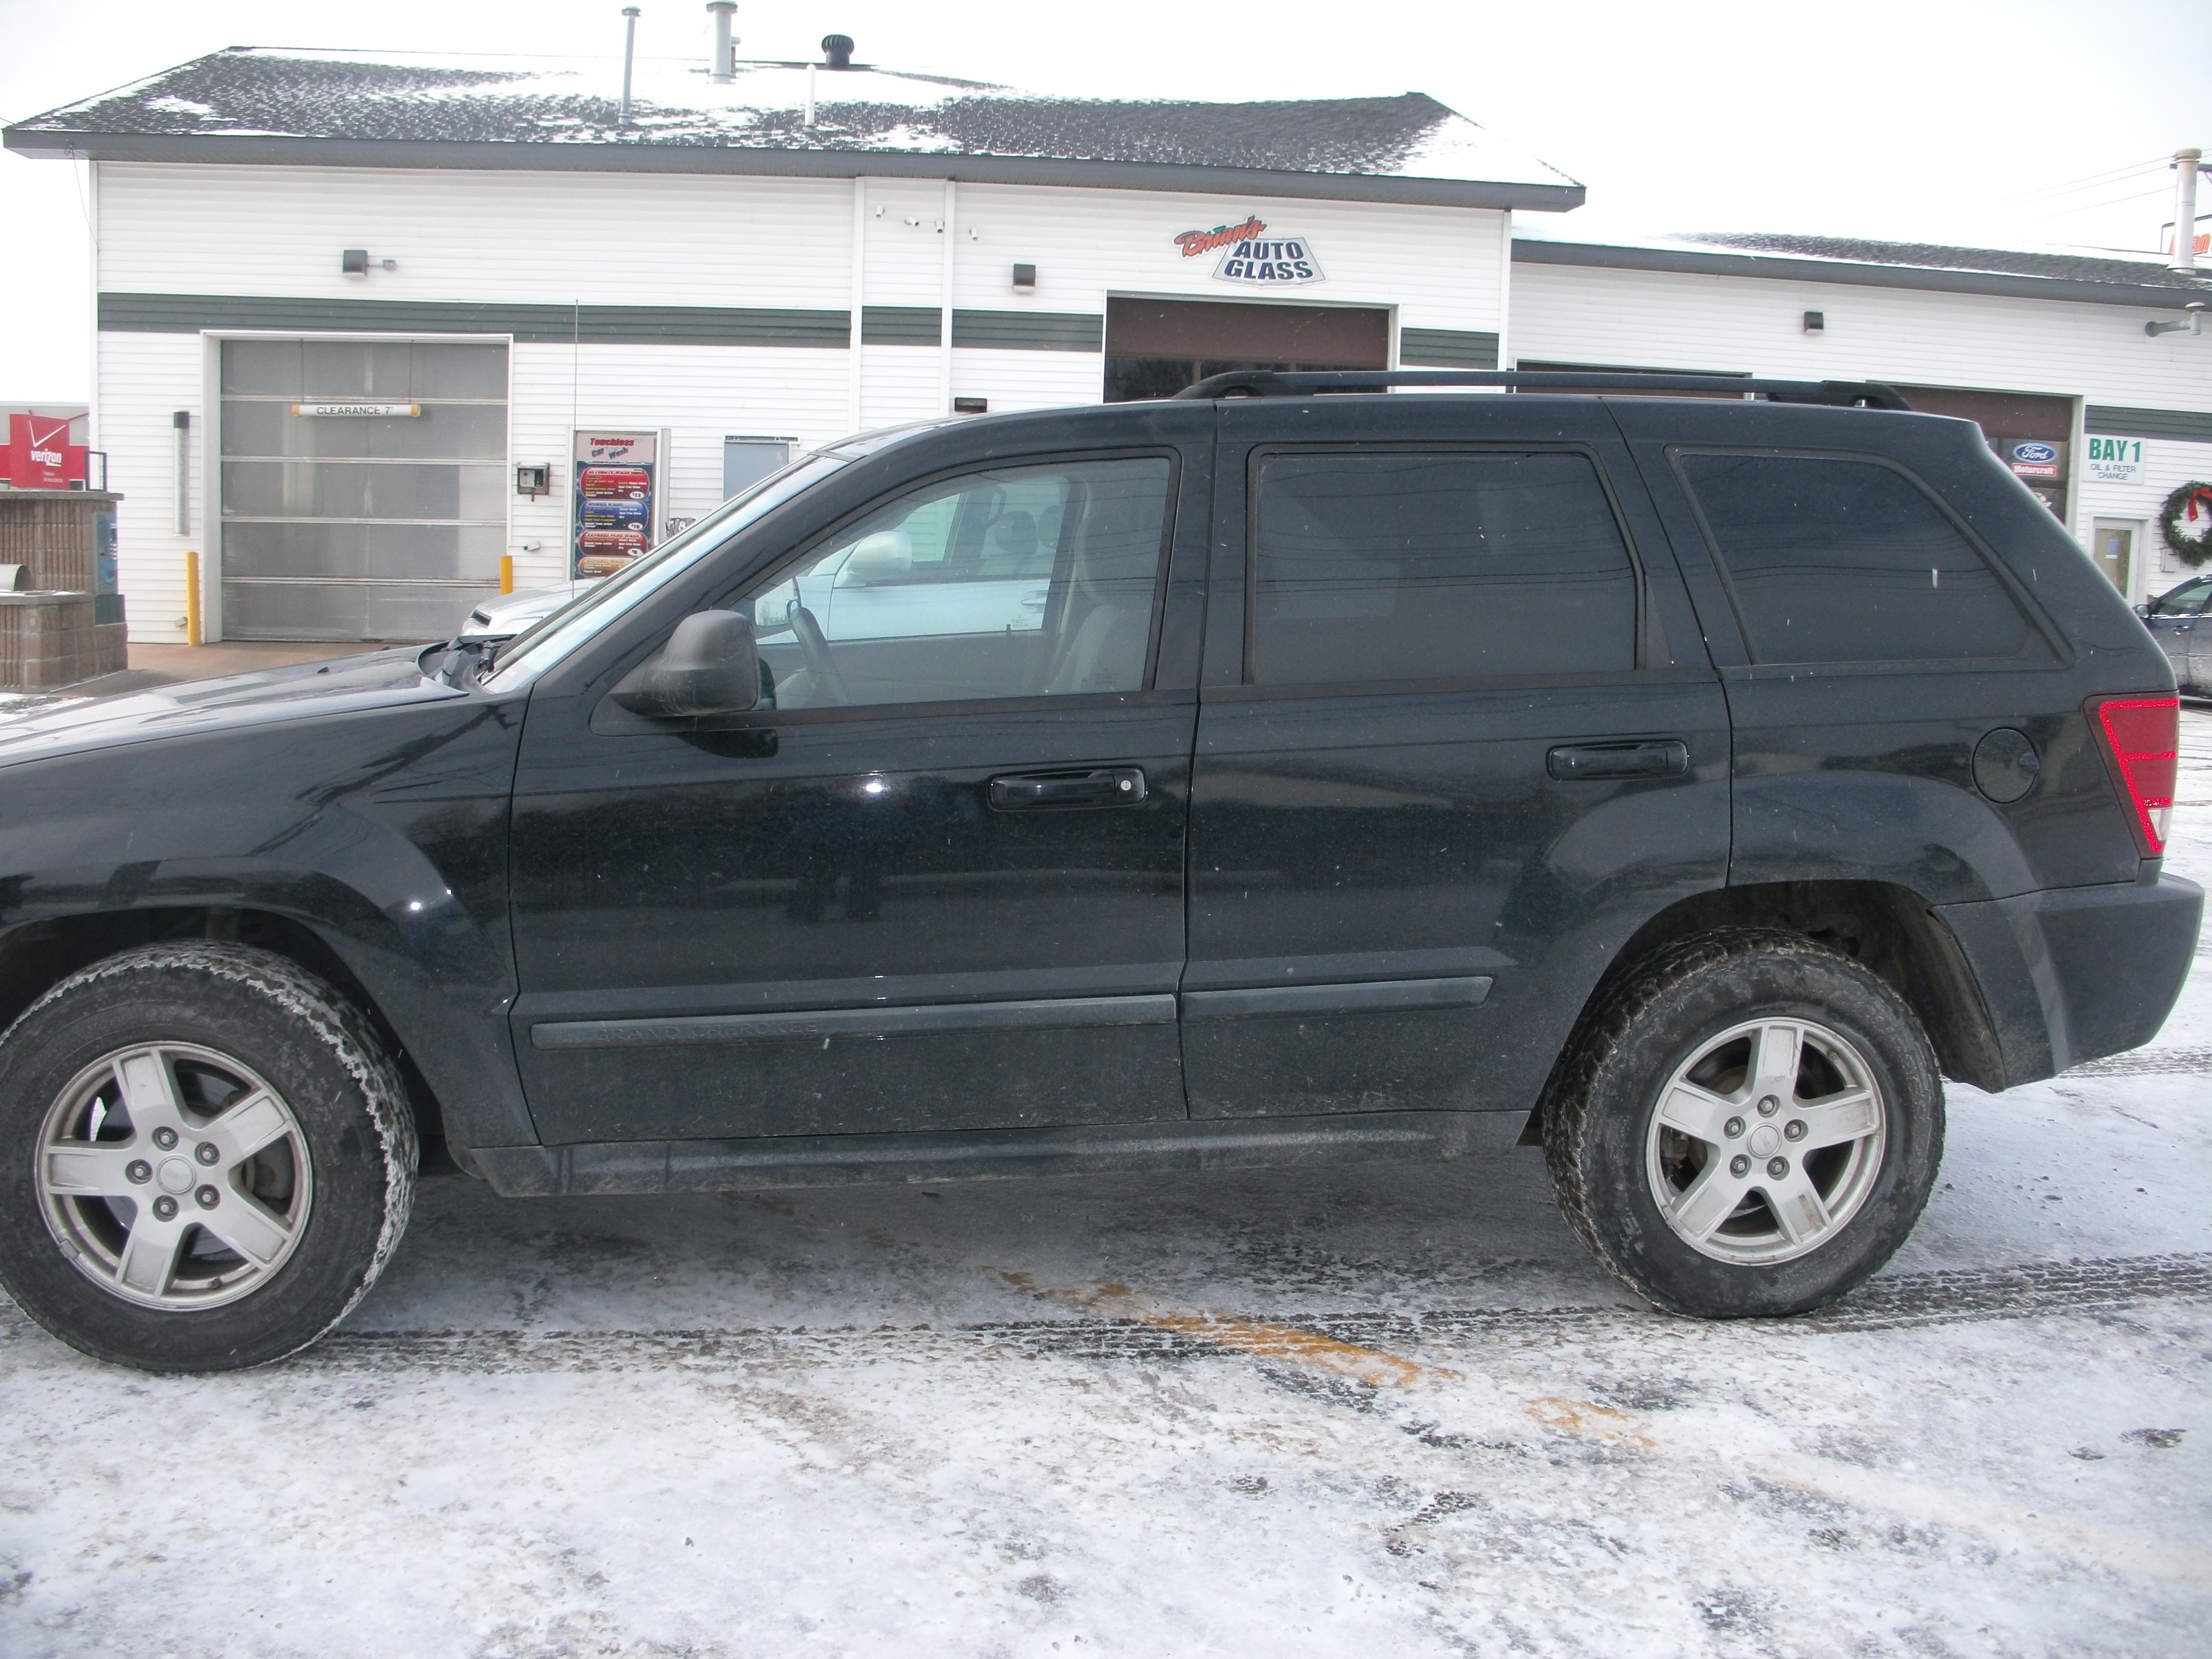 2007 Jeep Grand Cherokee Laredo >> 2007 Jeep Grand Cherokee Laredo 4 Wd Great Lakes First